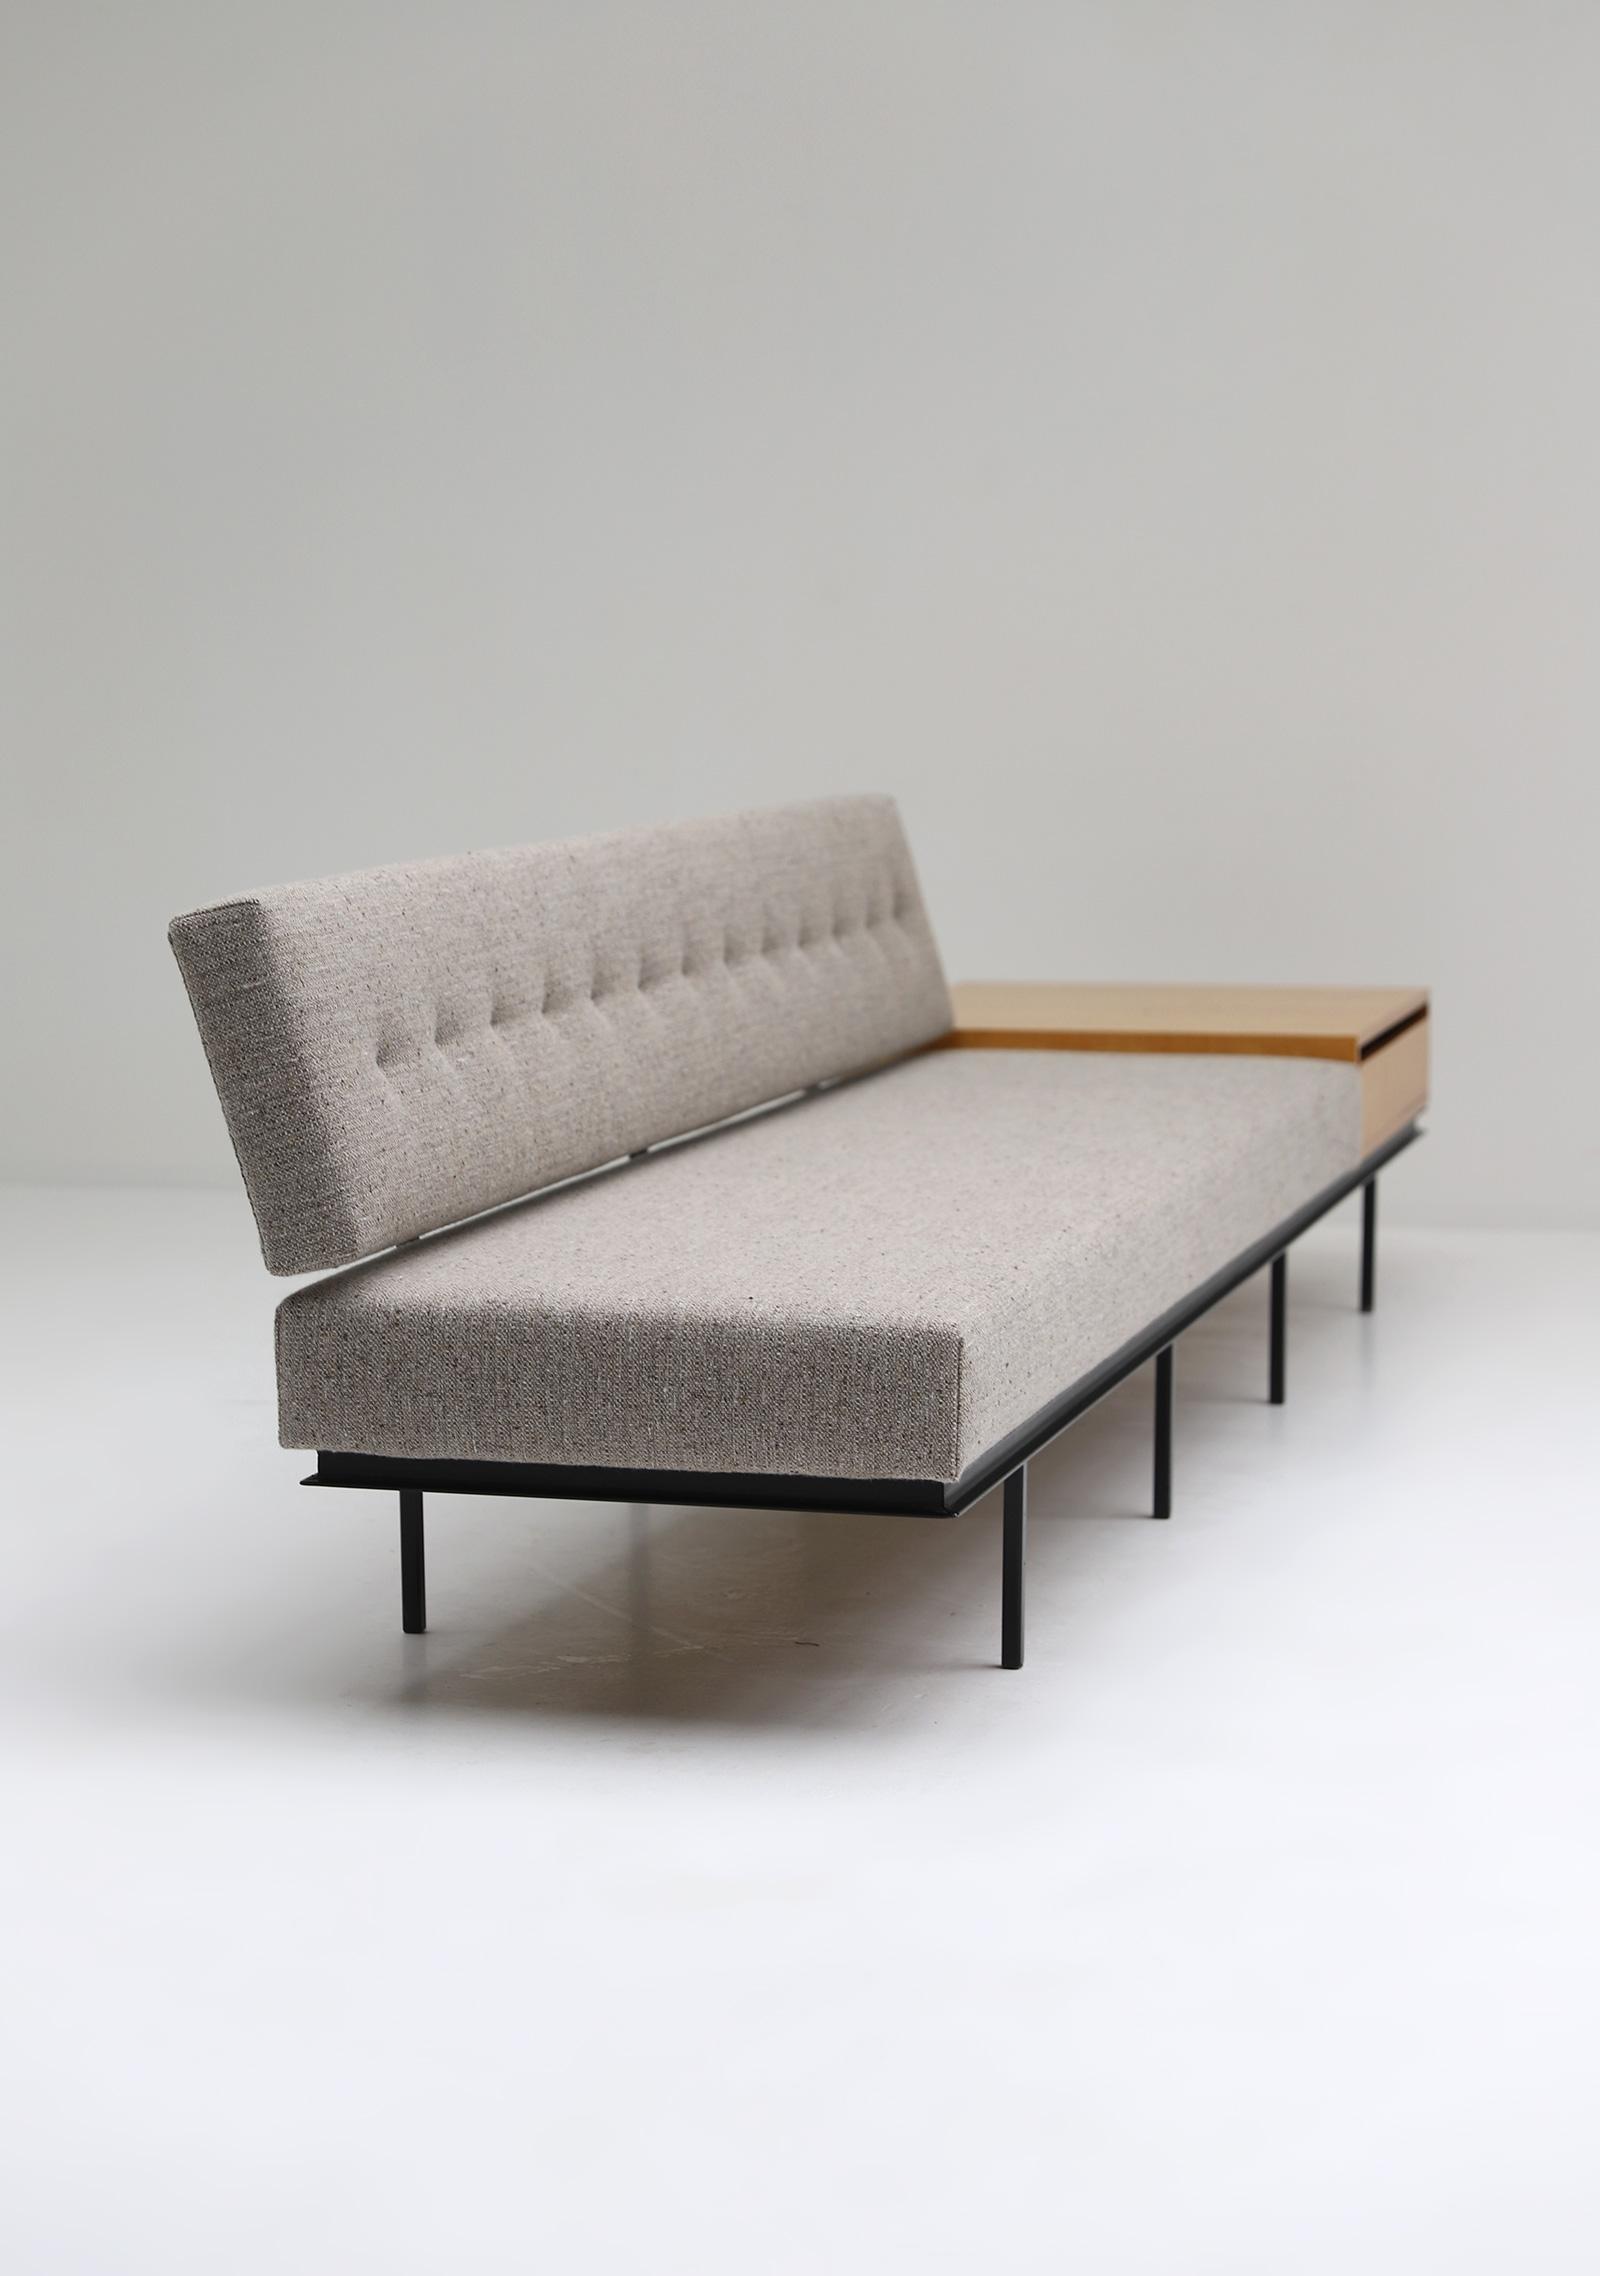 Florence Knoll Sofa & Cabinet image 7